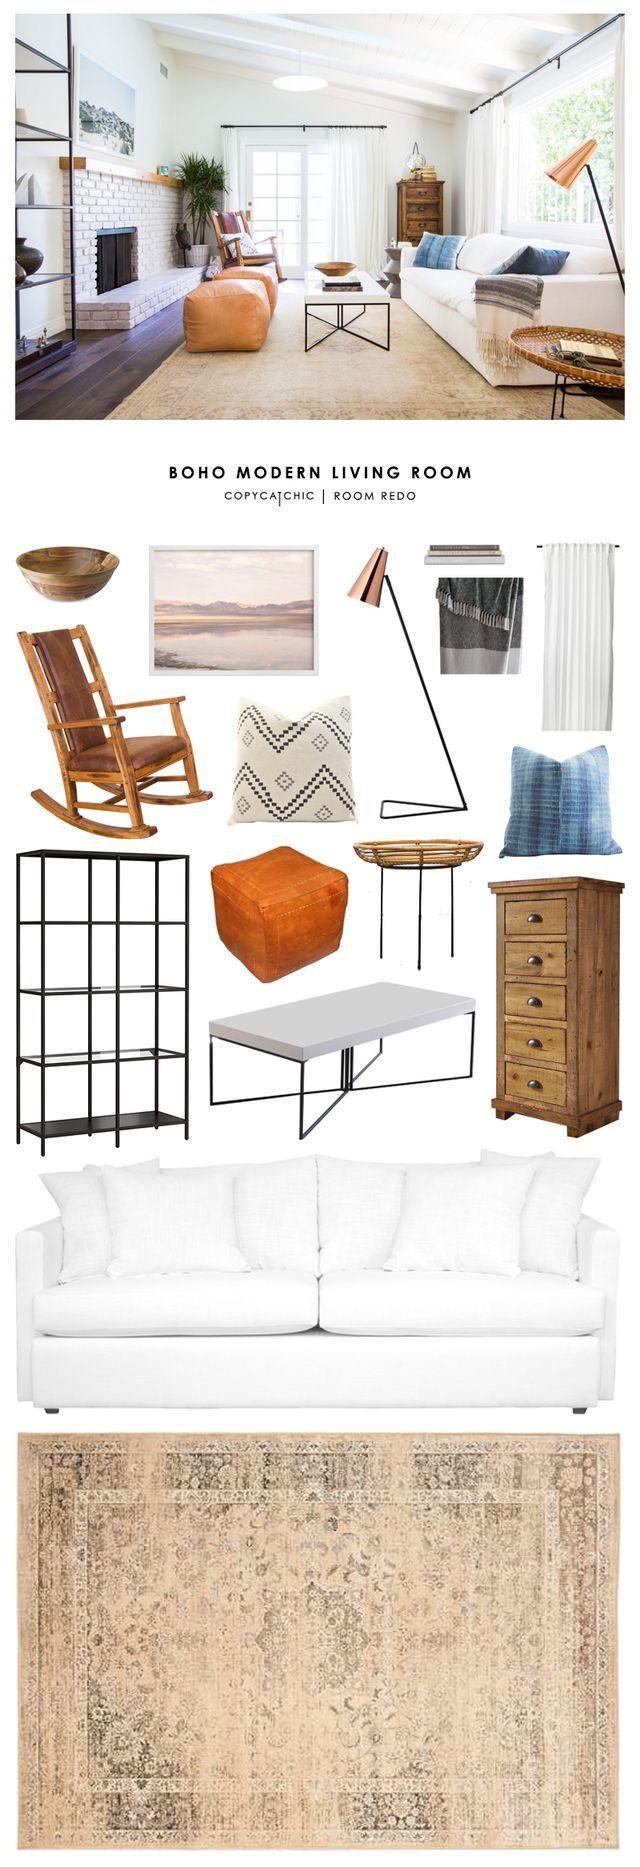 redo living room. Copy Cat Chic Room Redo Best 25  Living room redo ideas on Pinterest Traditional living